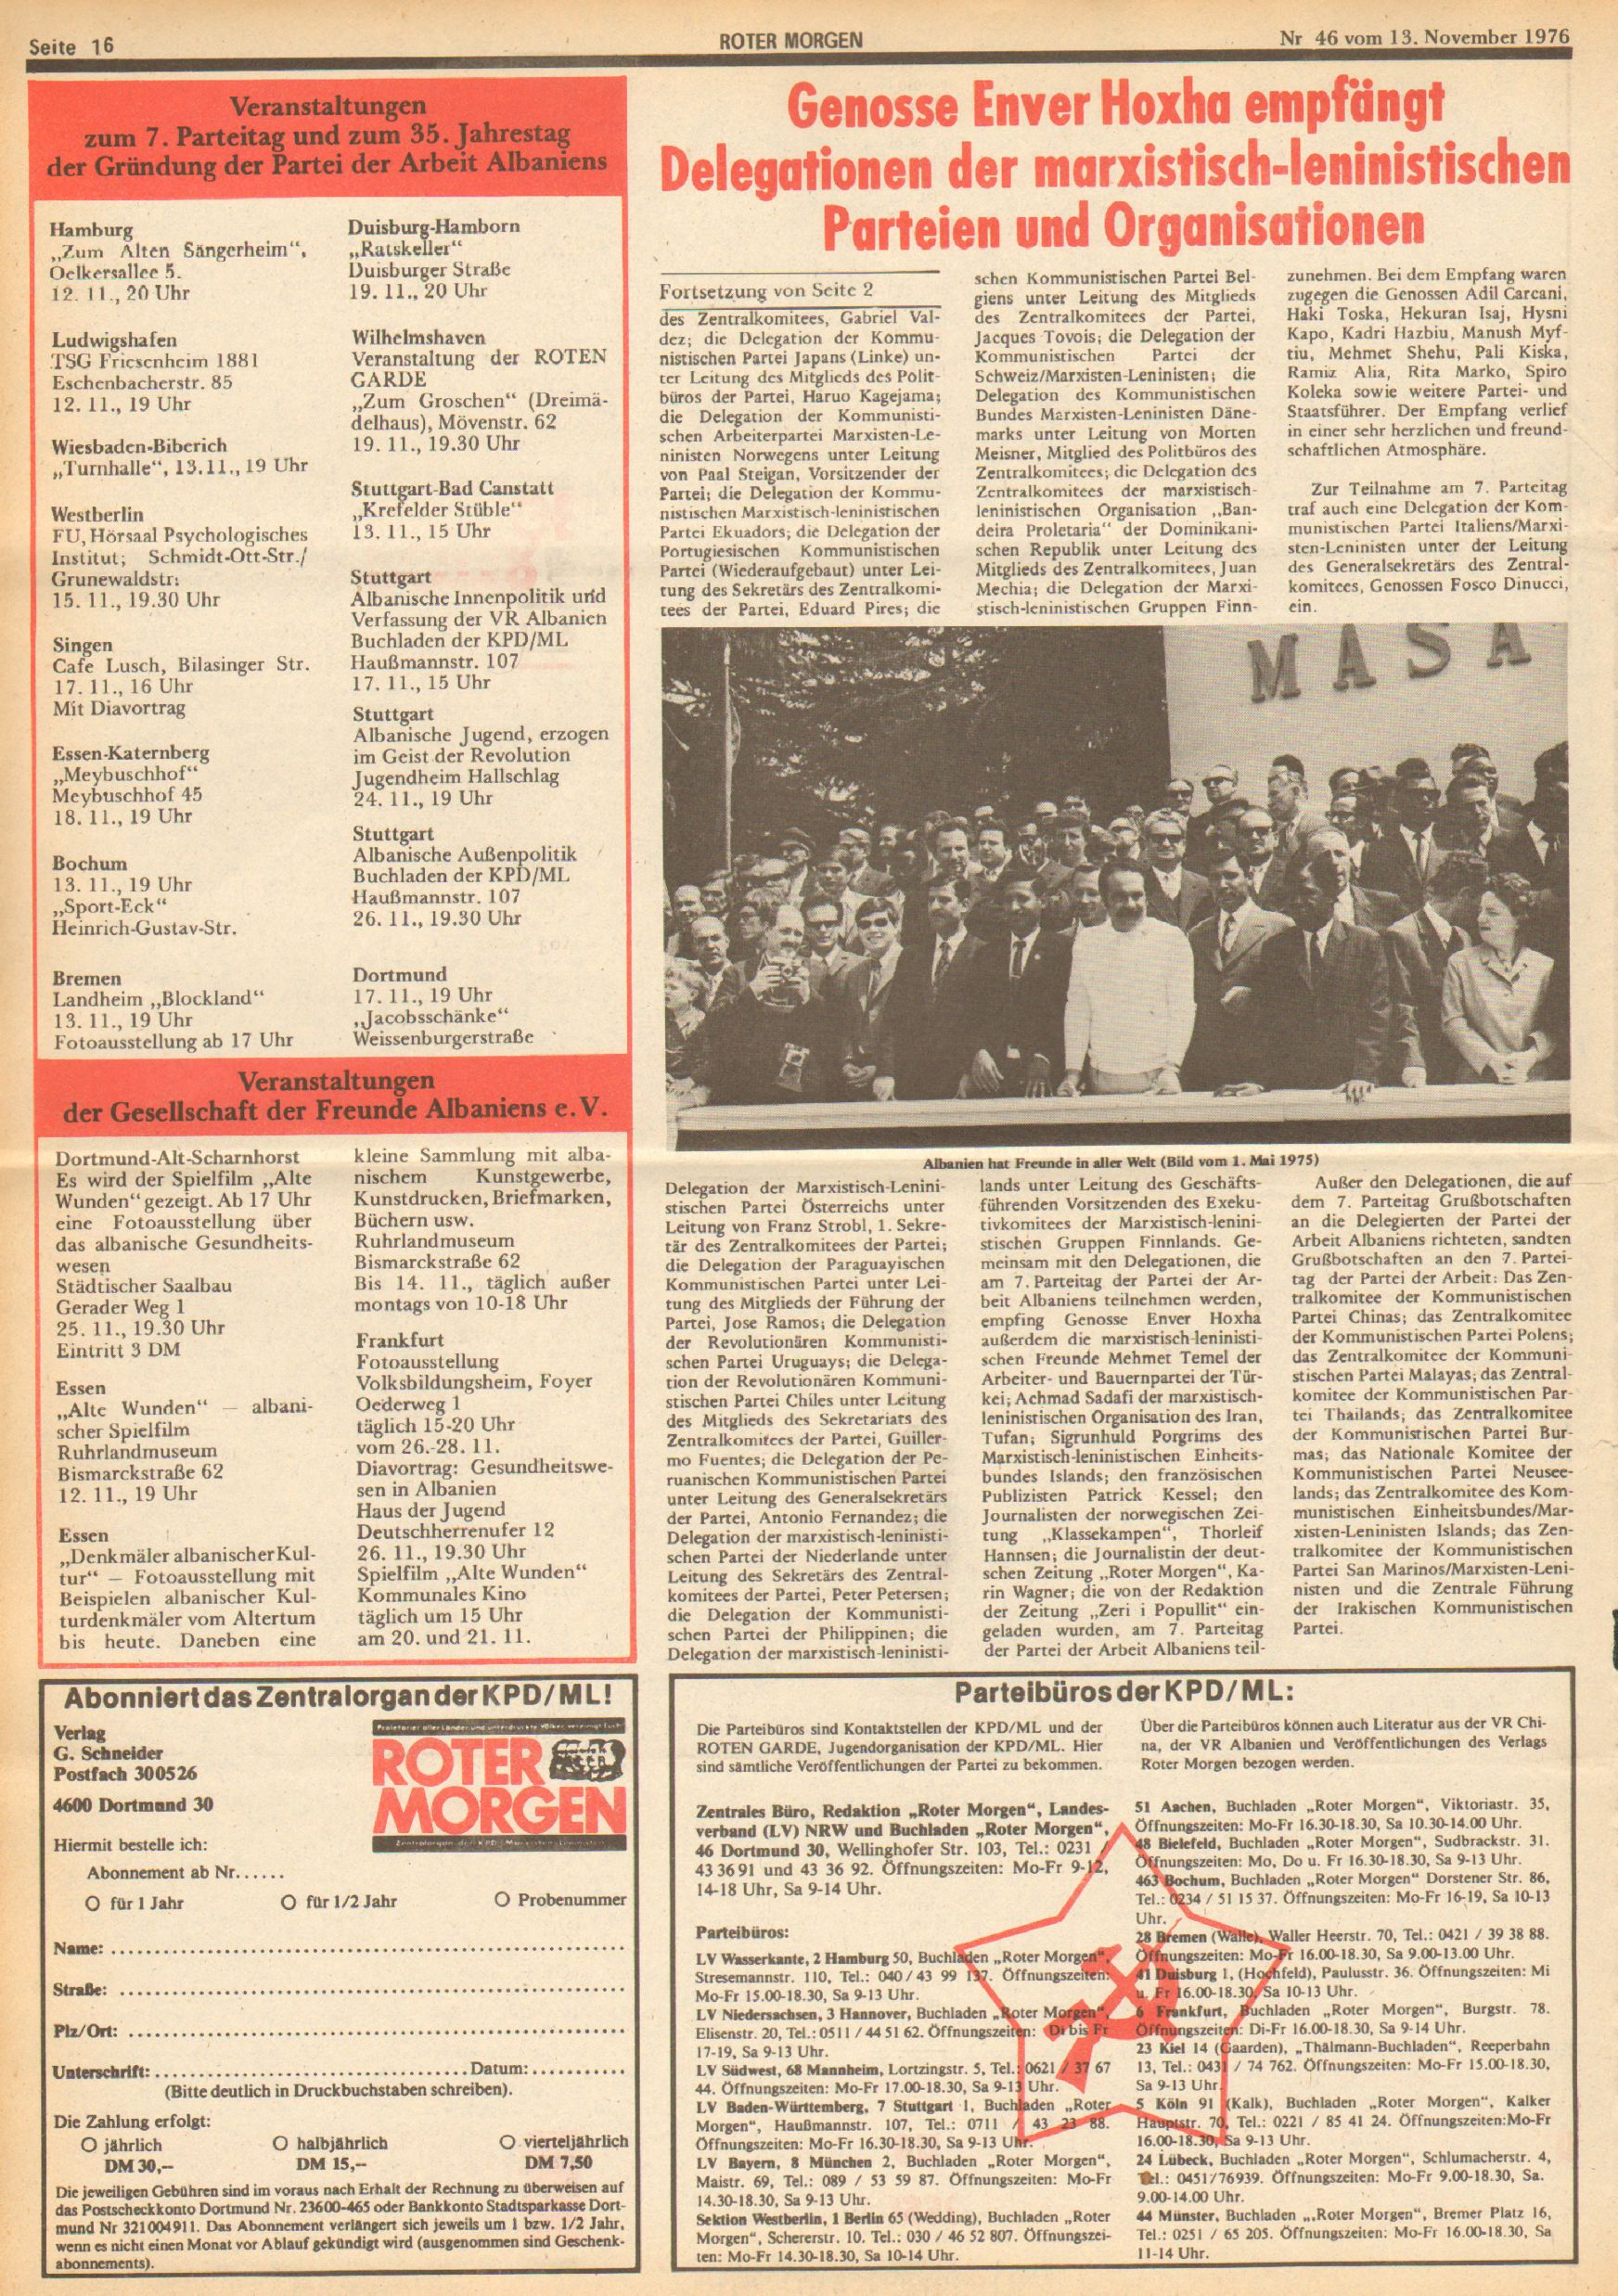 Roter Morgen, 10. Jg., 13. November 1976, Nr. 46, Seite 16